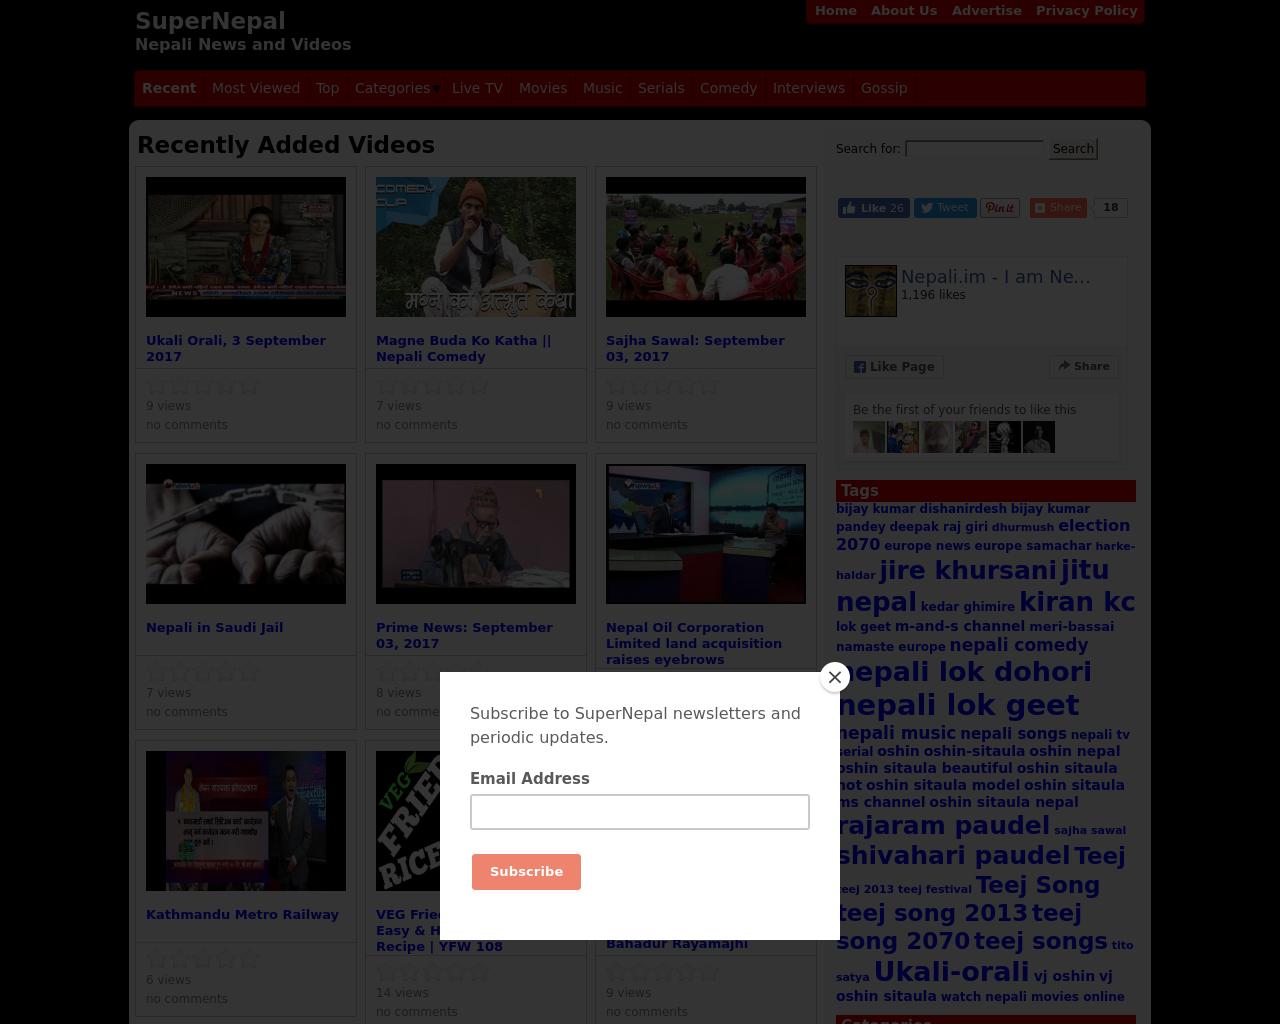 Supernepal-Advertising-Reviews-Pricing